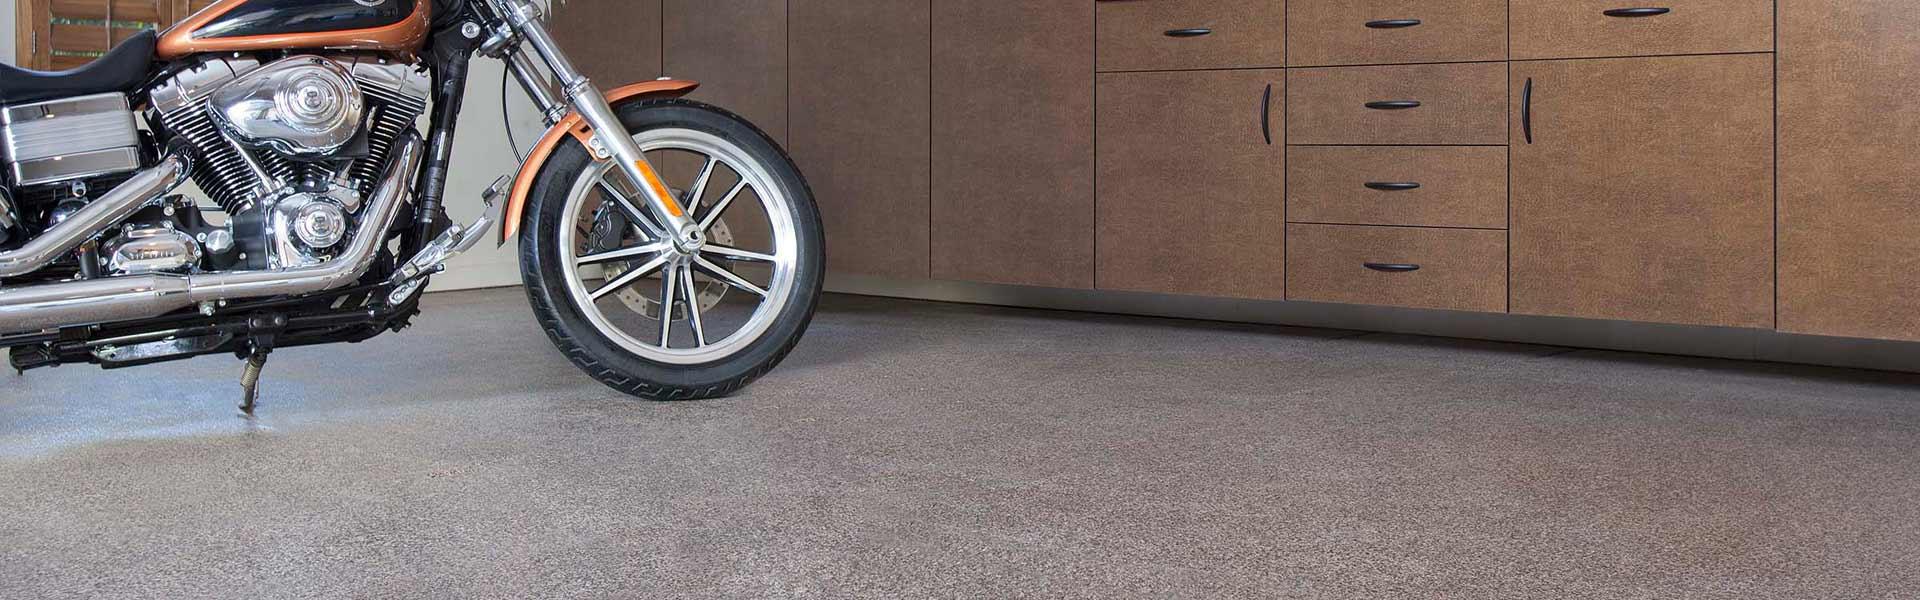 Garage Flooring Options Custom Garage Floors Garage Floors - Traxtile flooring